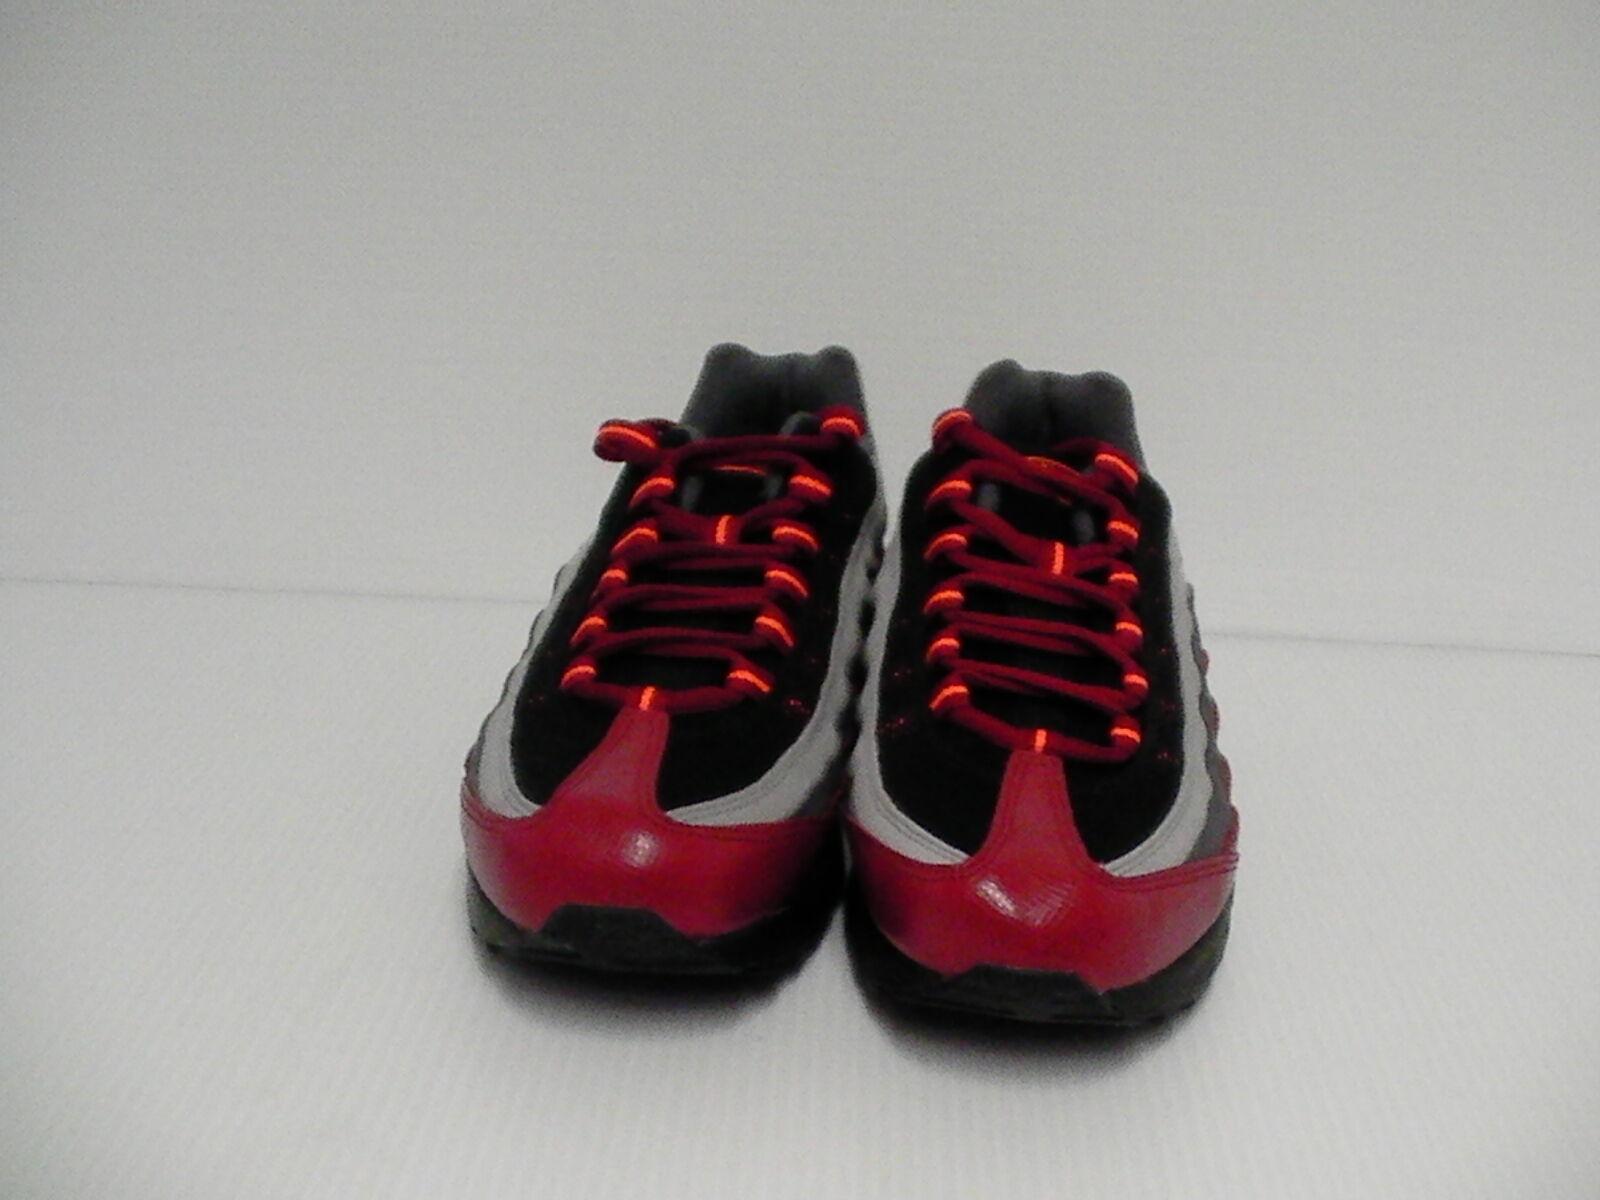 Nike Nike Nike air max 95 (gs)  5,5 jugend uns ausbildung laufschuhe 7acb2b